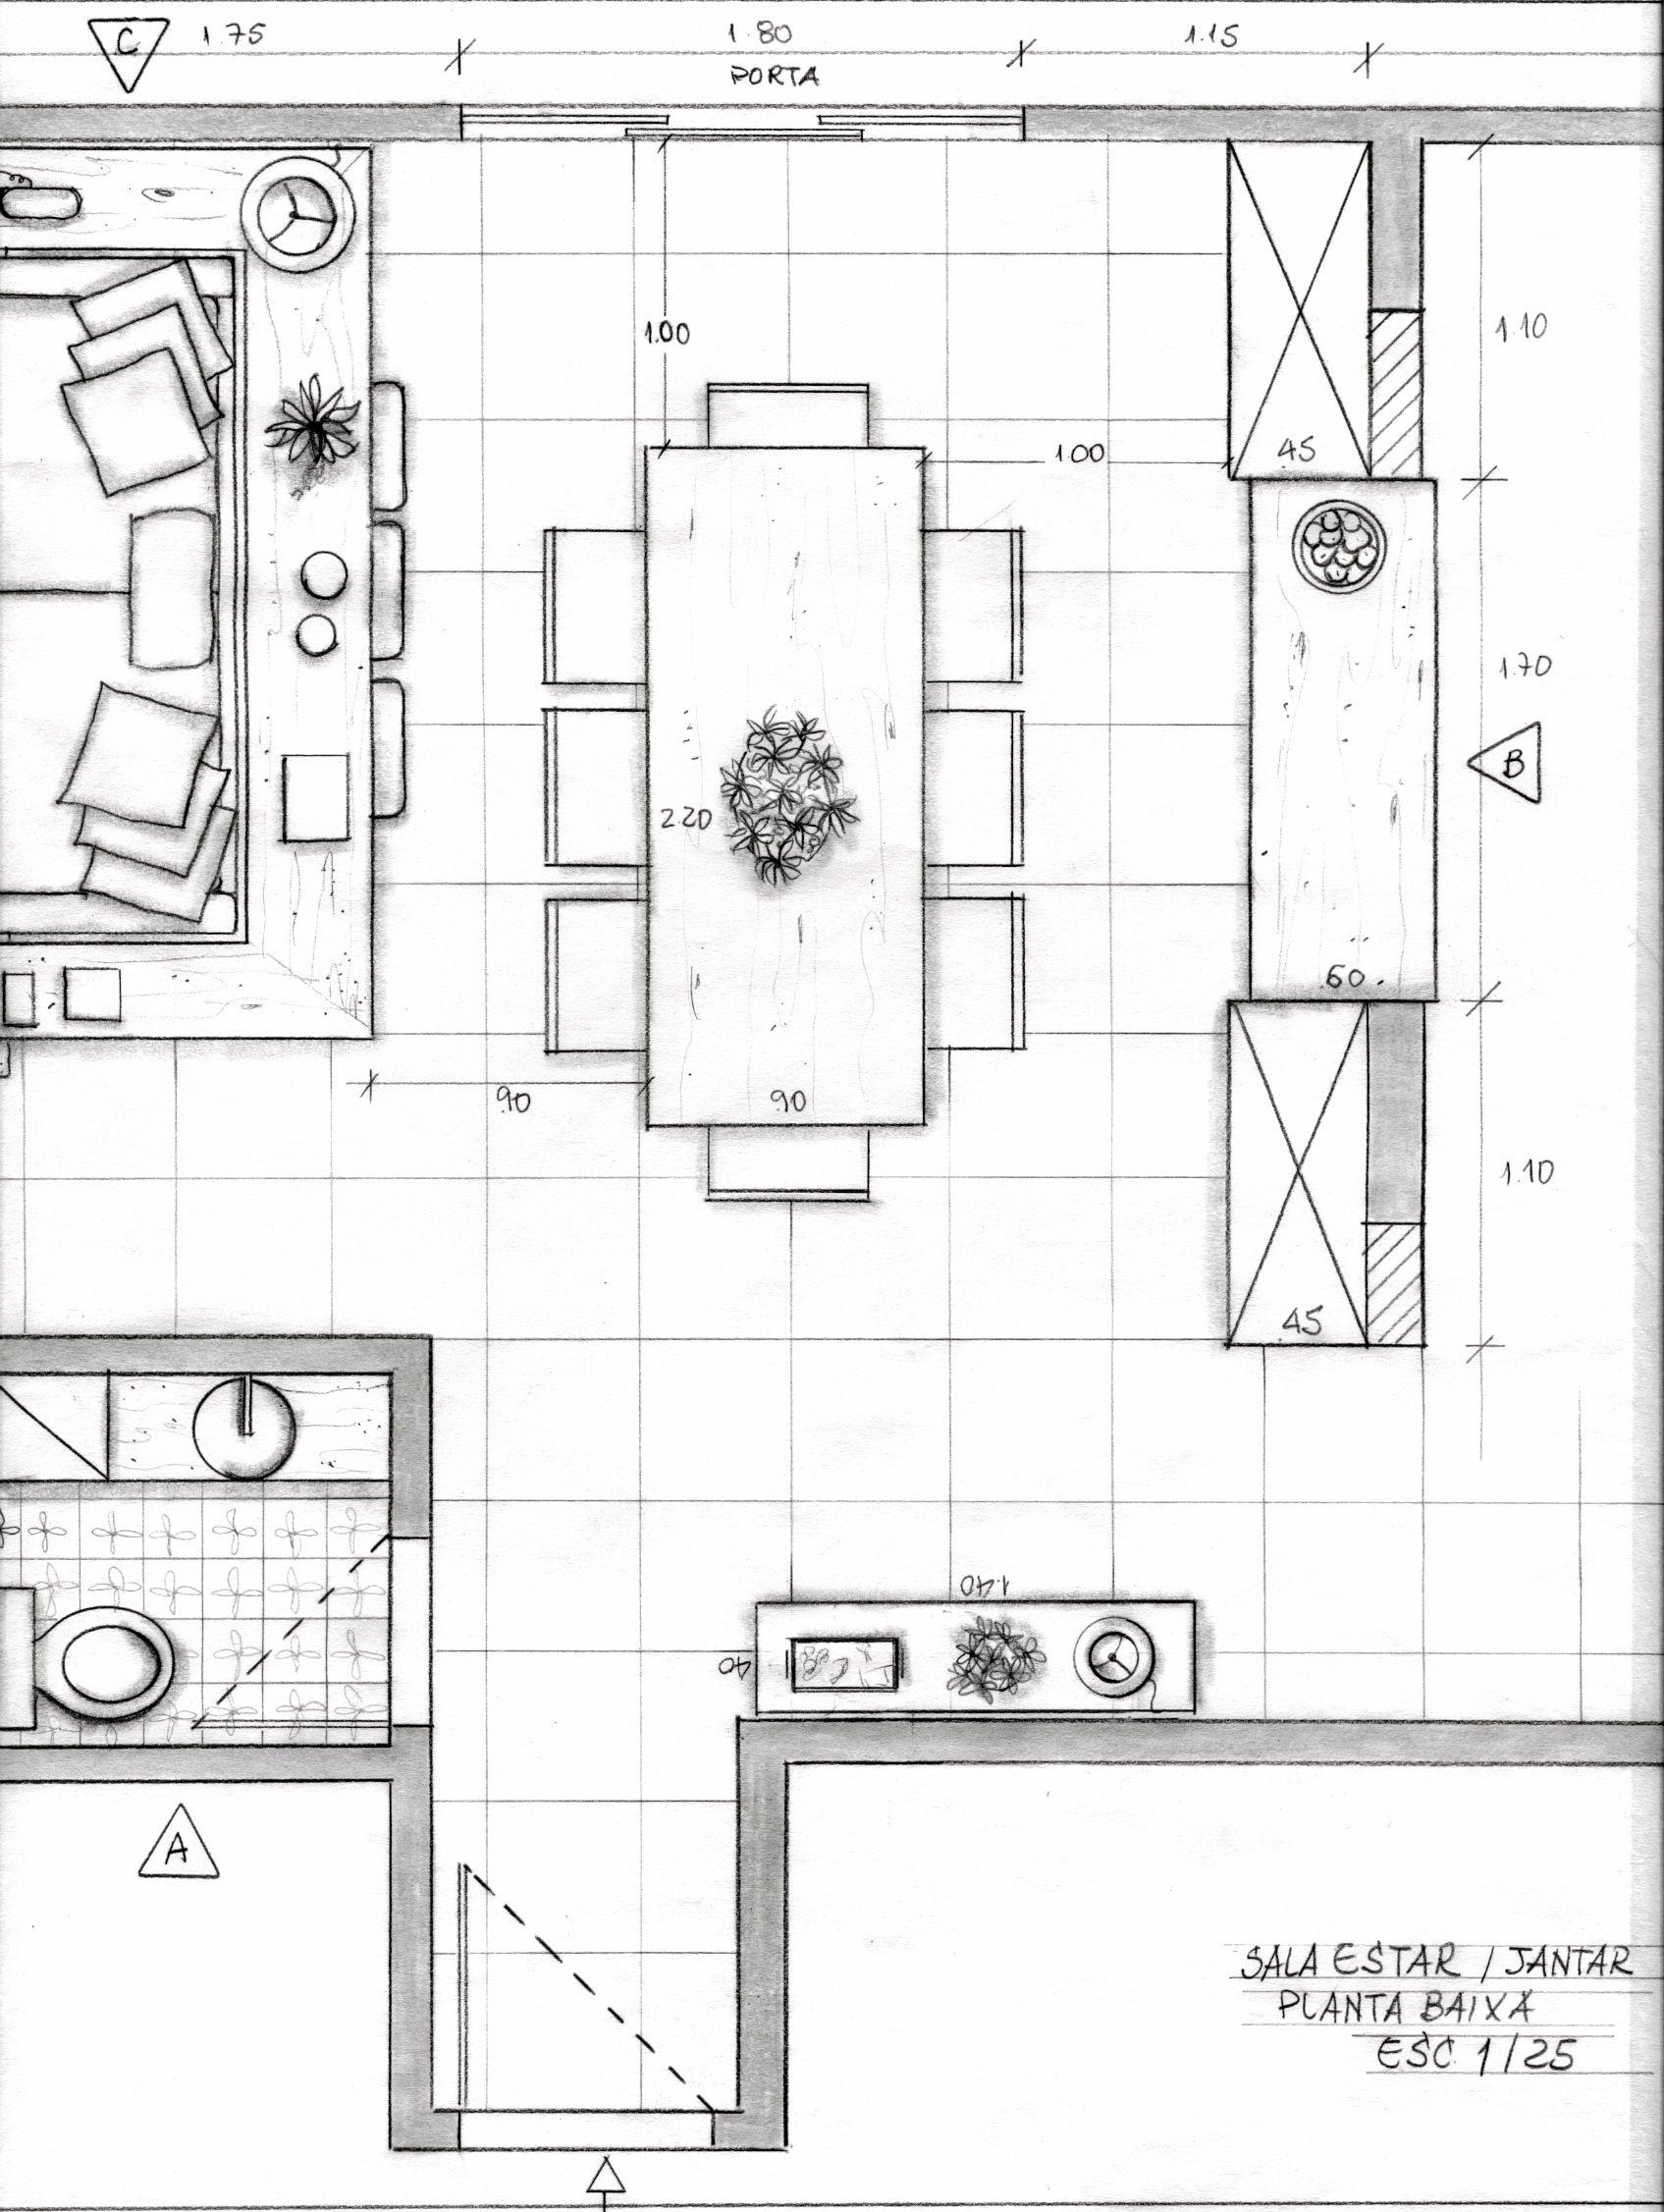 Planta baixa sala de estar